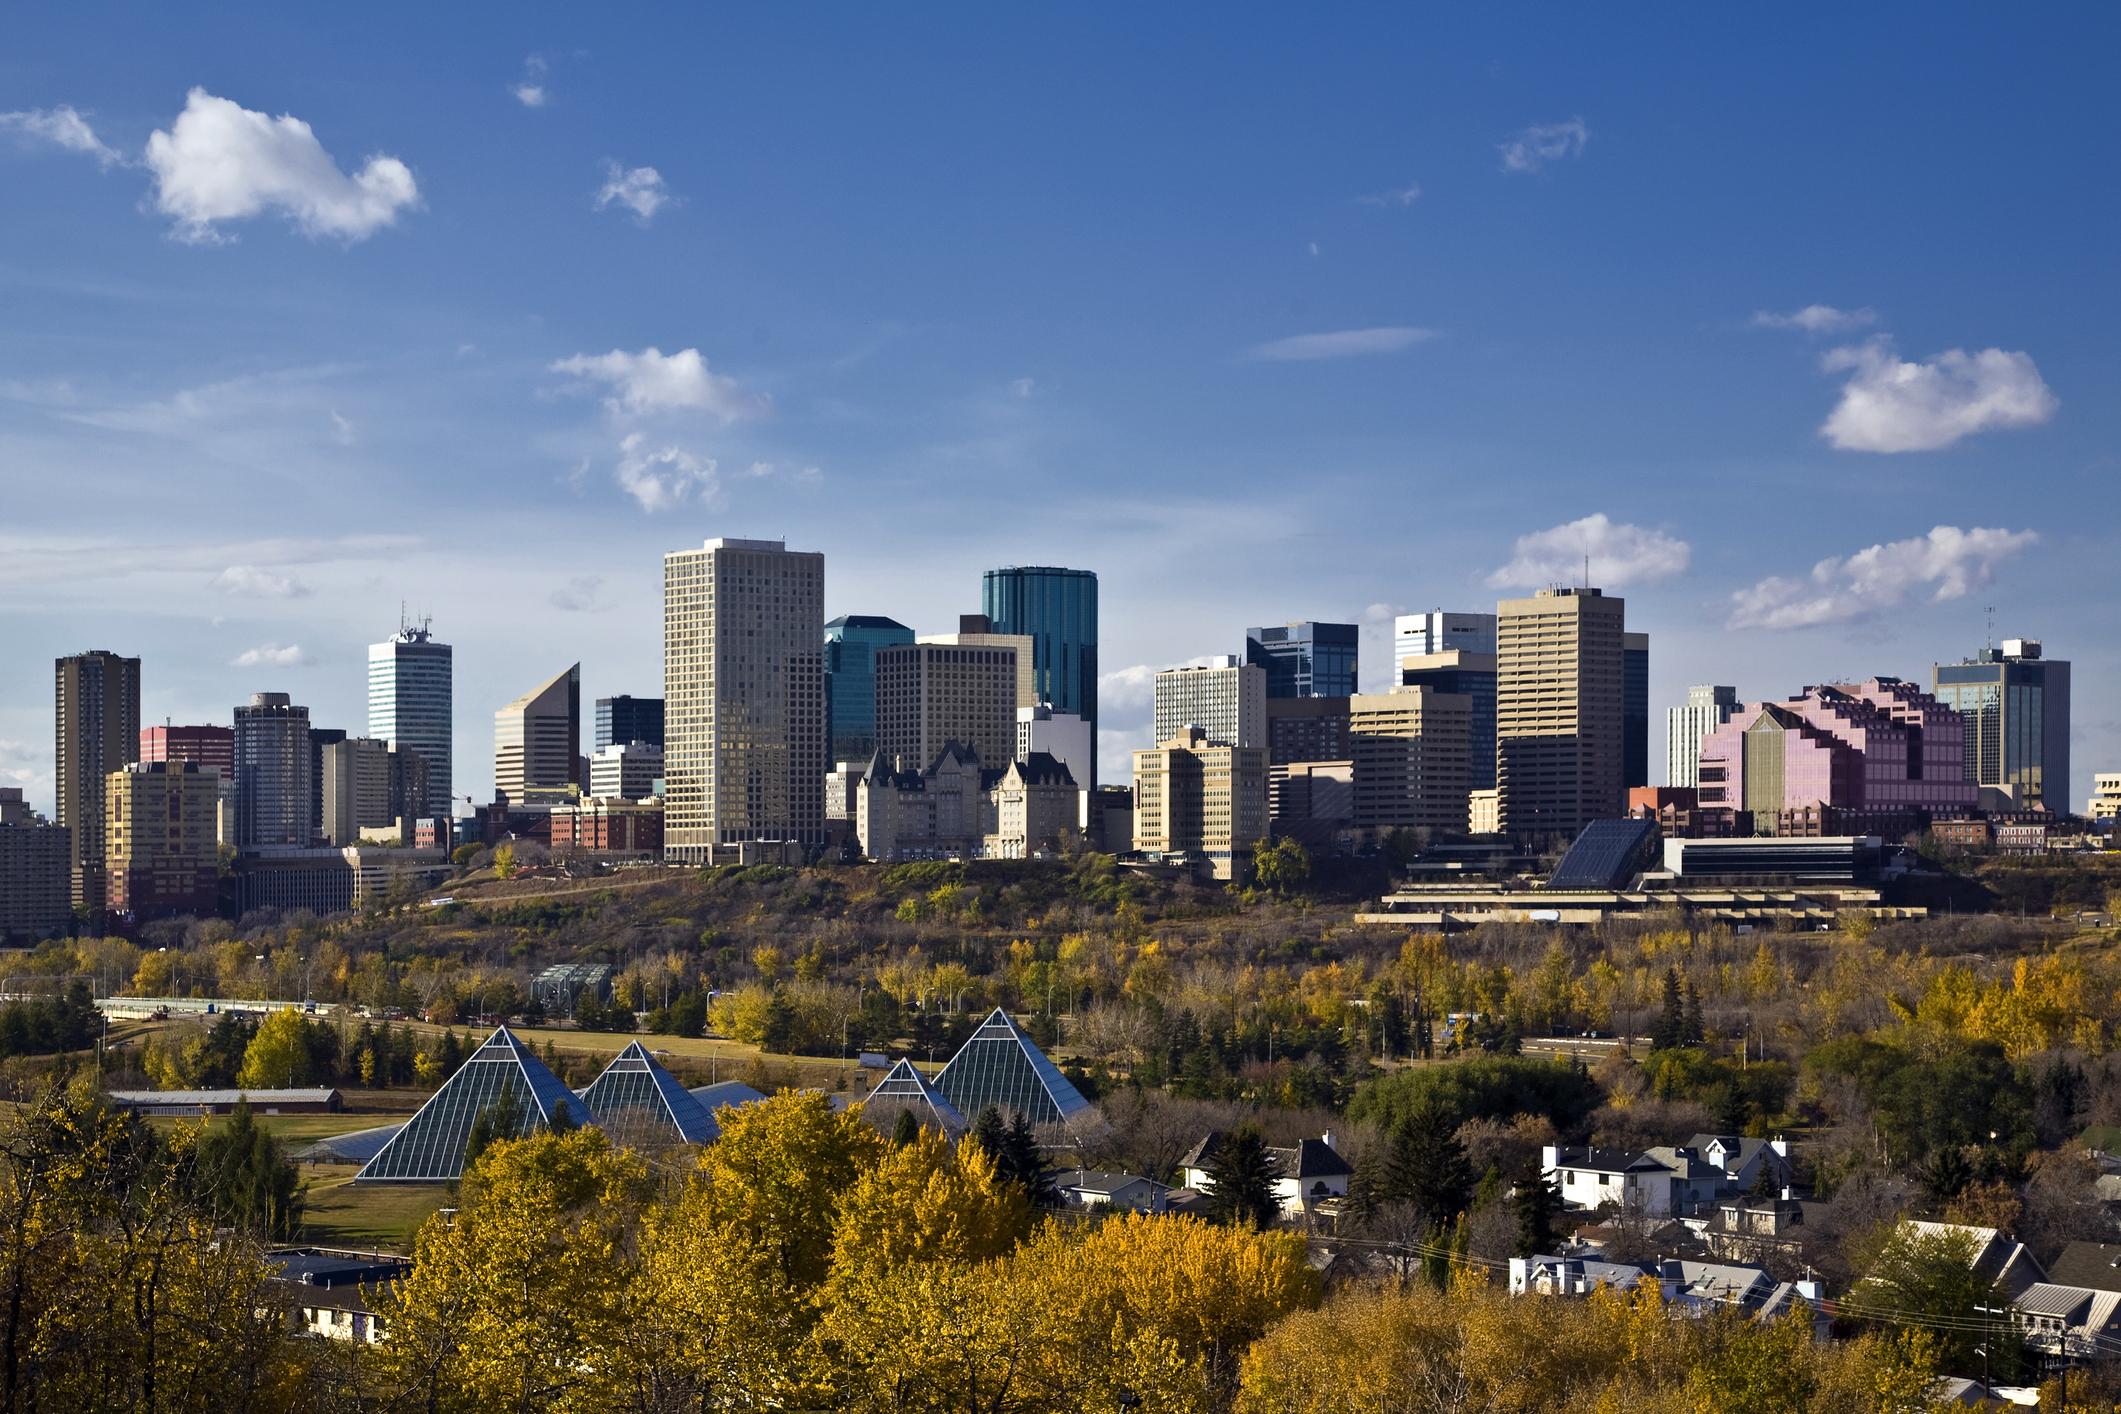 Alberta Canada the scene of an Islamophobic attack on two sisters